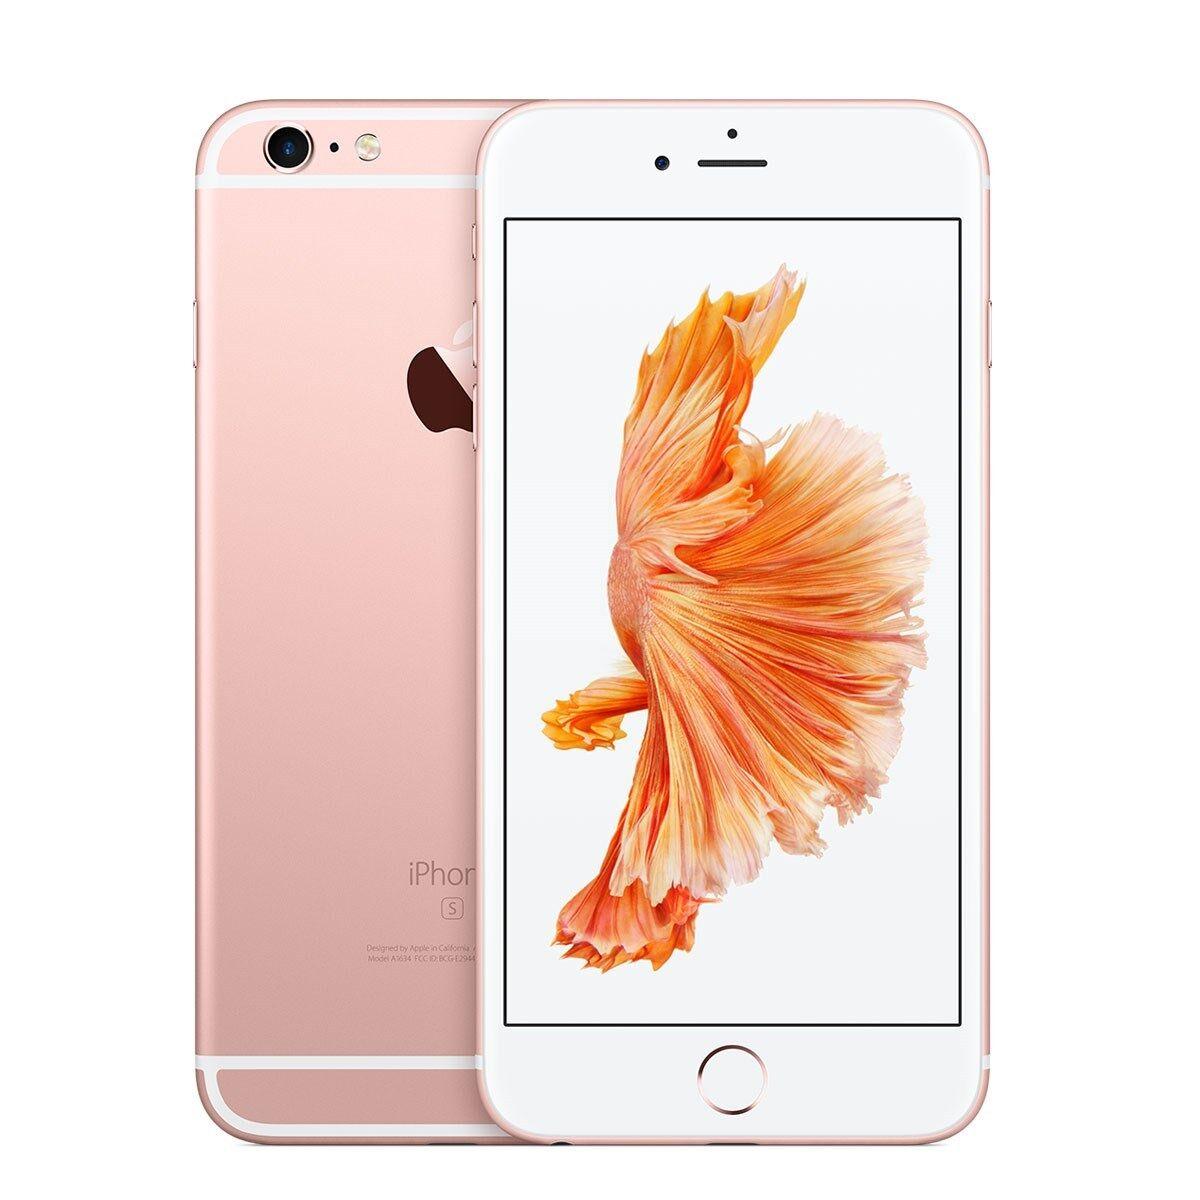 Apple iPhone 6S 32GB Unlocked Smartphone